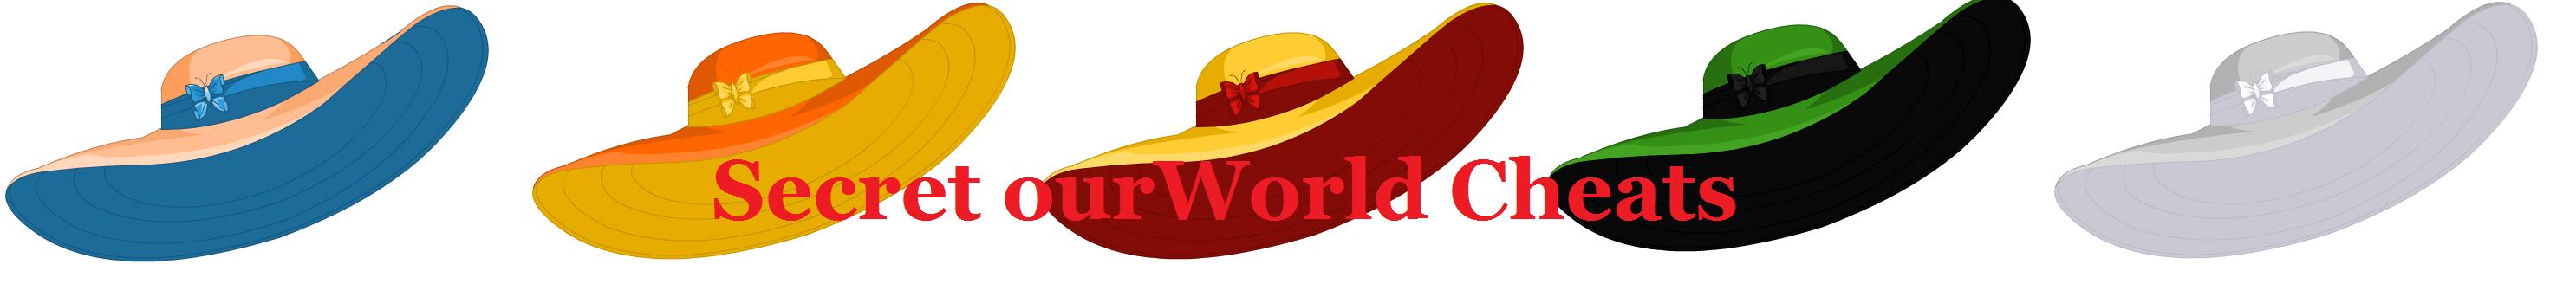 Unkown Hats